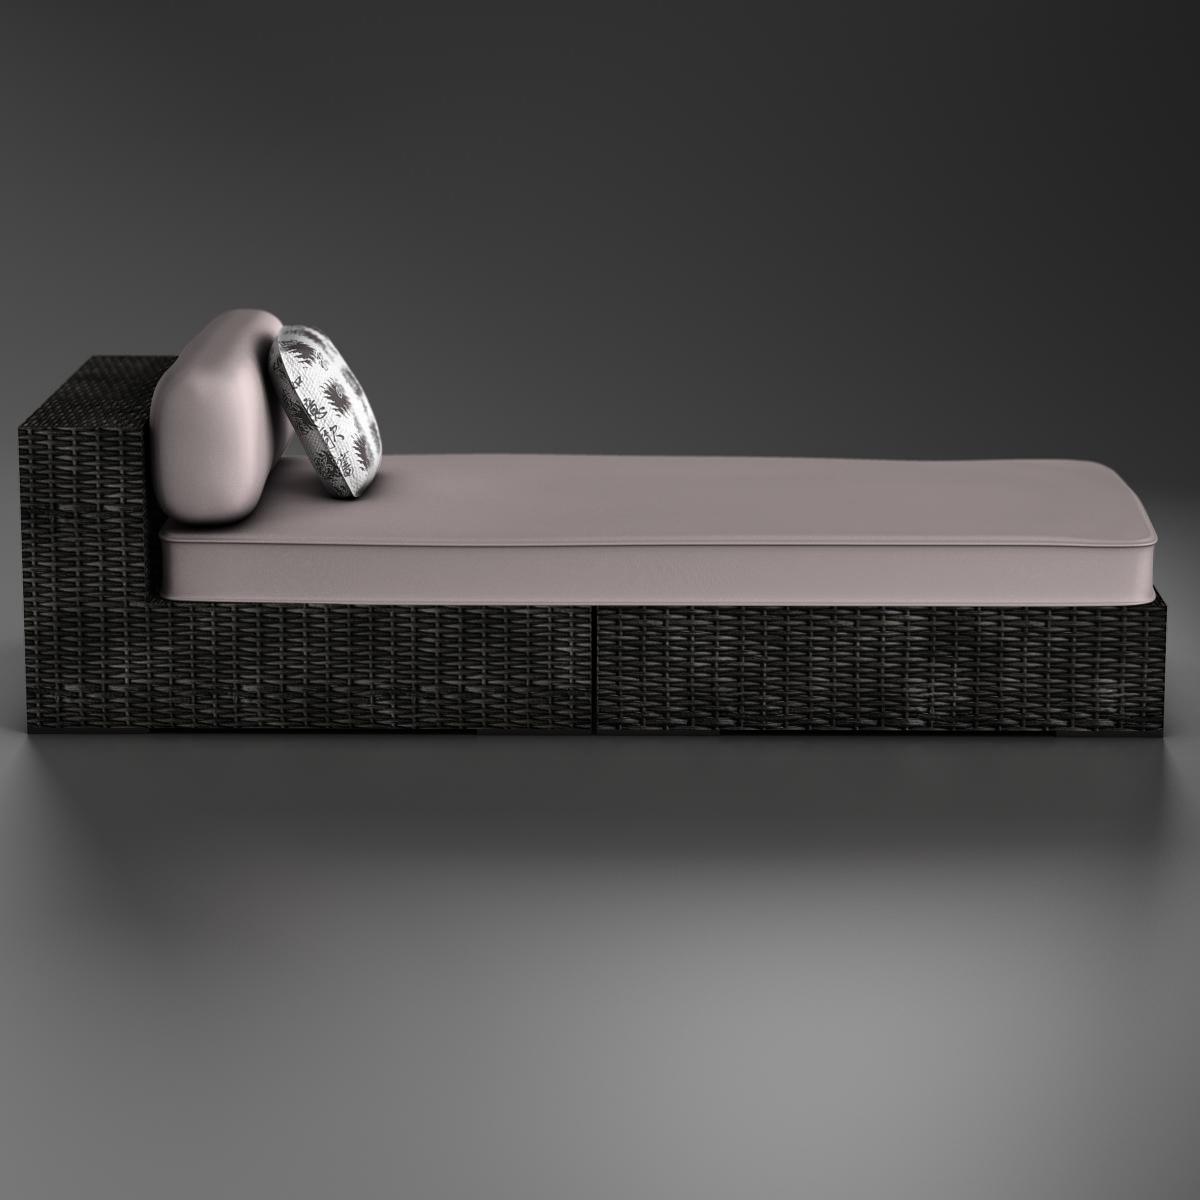 rattan chaise 3d загвар 3ds max fbx c4d ma mb obj 162564